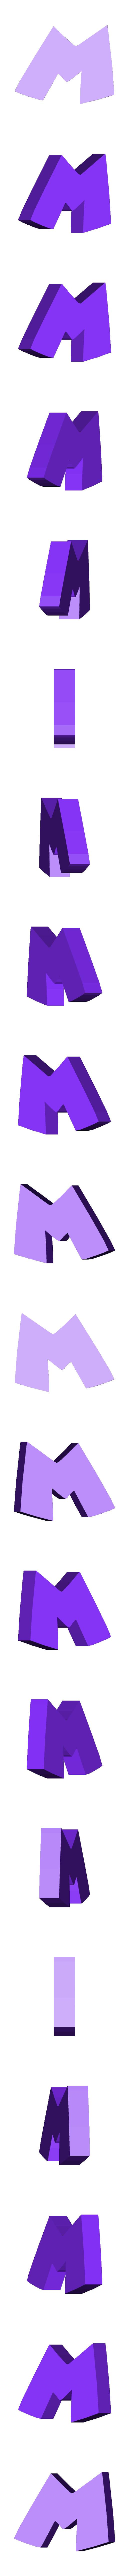 M.stl Download STL file LETTERS AND NUMBERS 3D COMIC • 3D printable design, mistic-3d